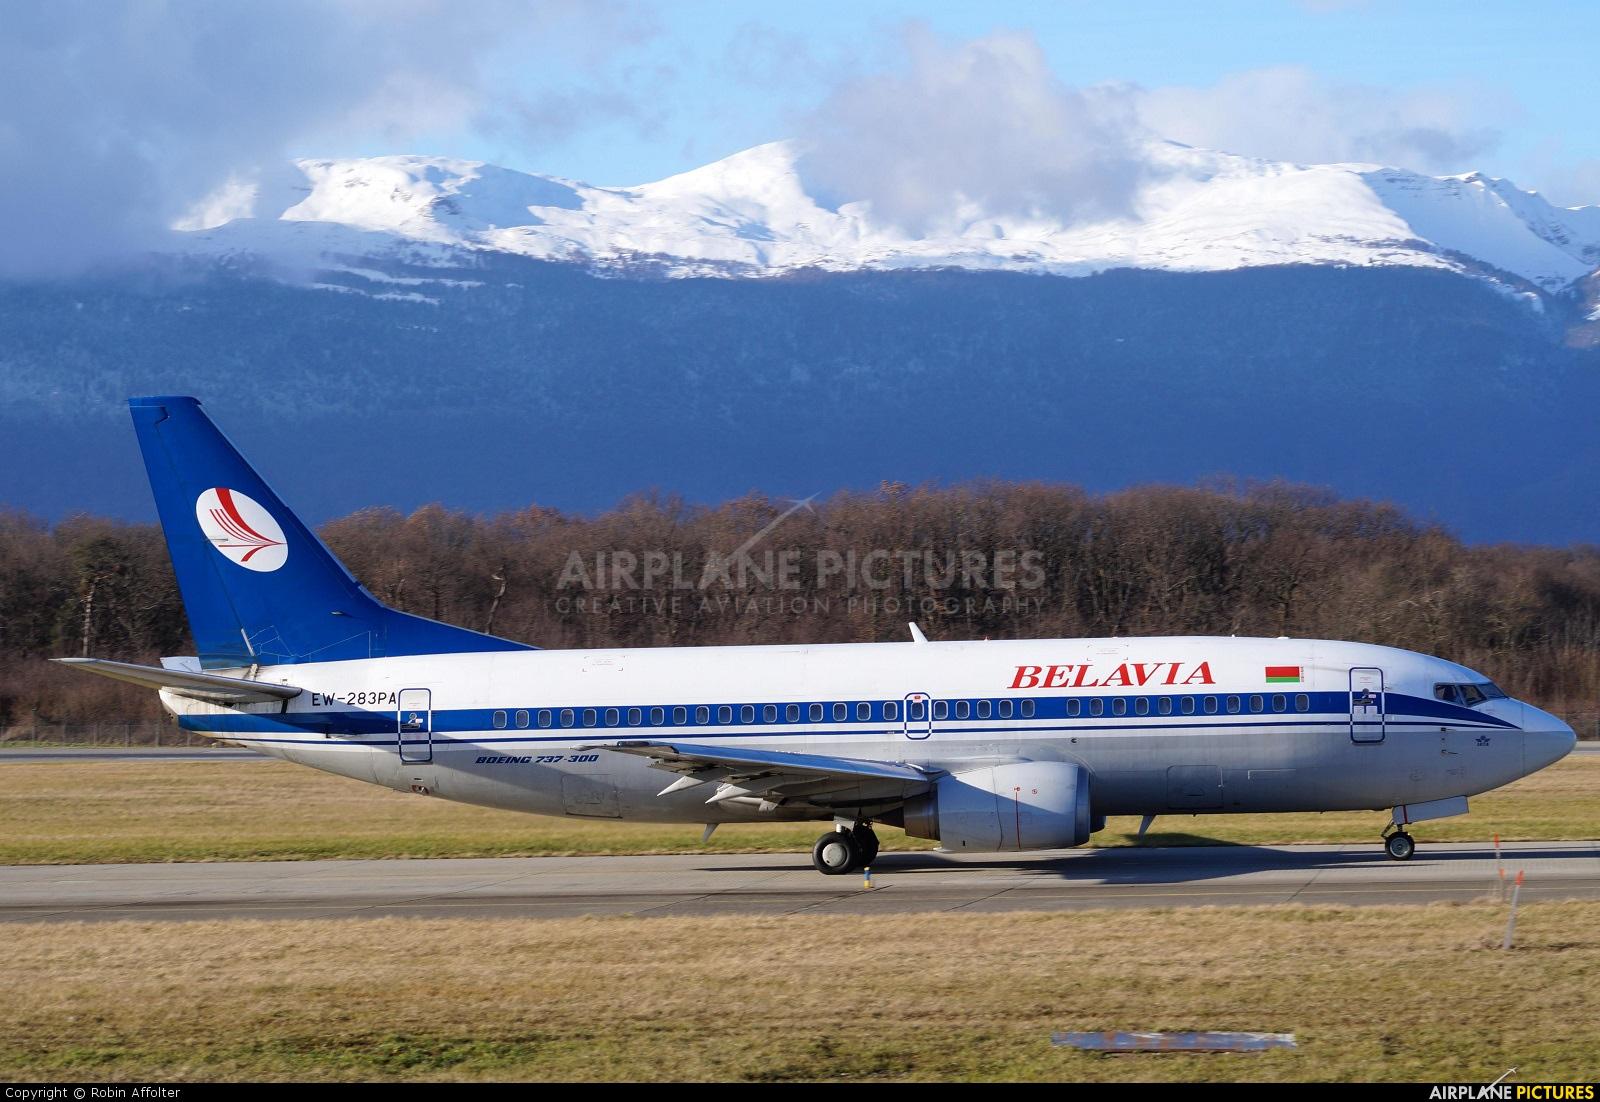 Belavia EW-283PA aircraft at Geneva Intl